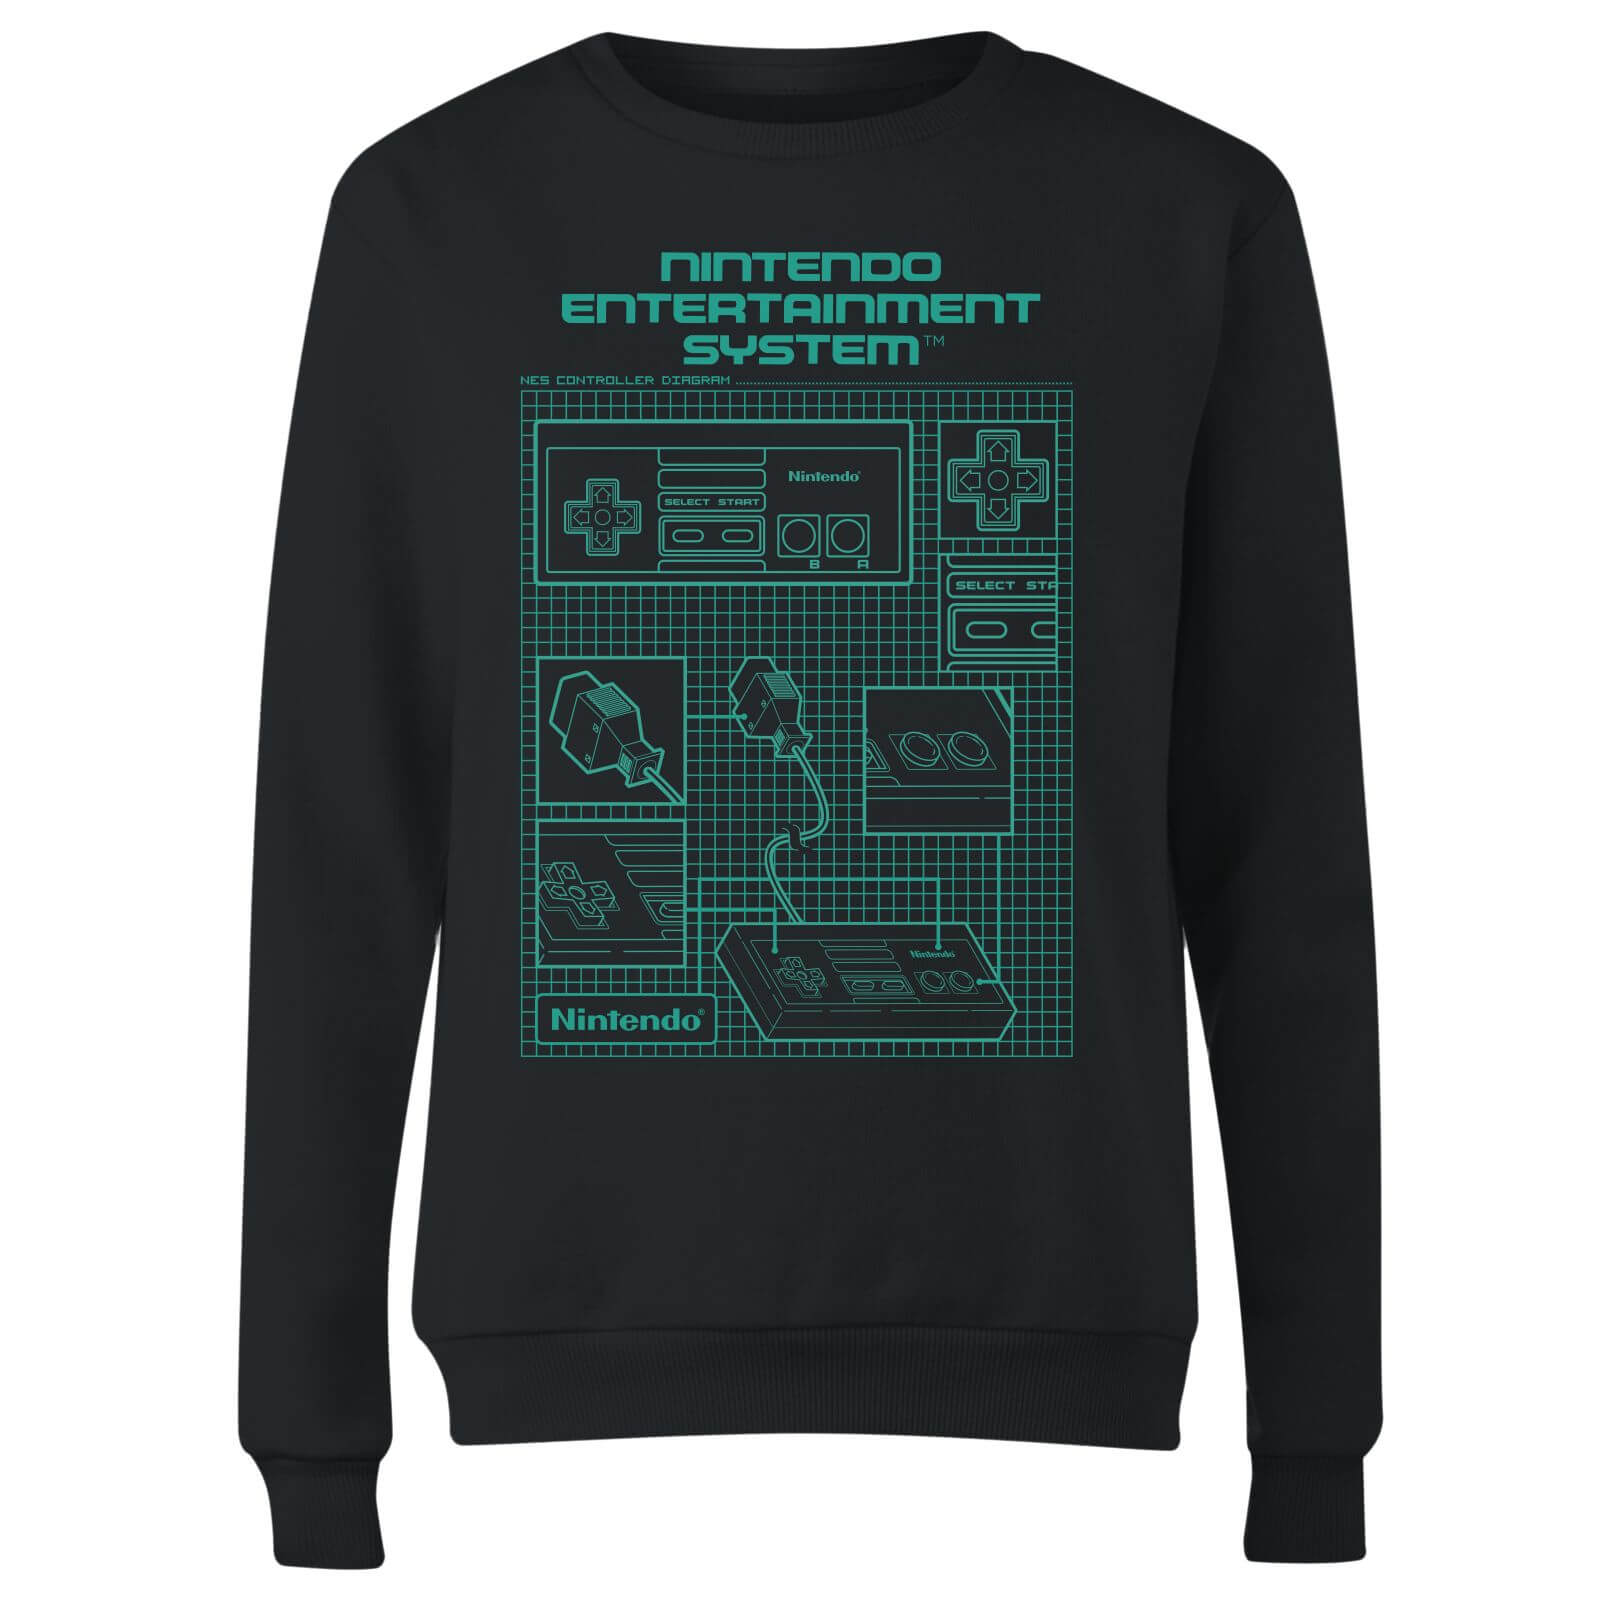 Nes controller blueprint black womens sweatshirt black clothing nes controller blueprint black women malvernweather Choice Image